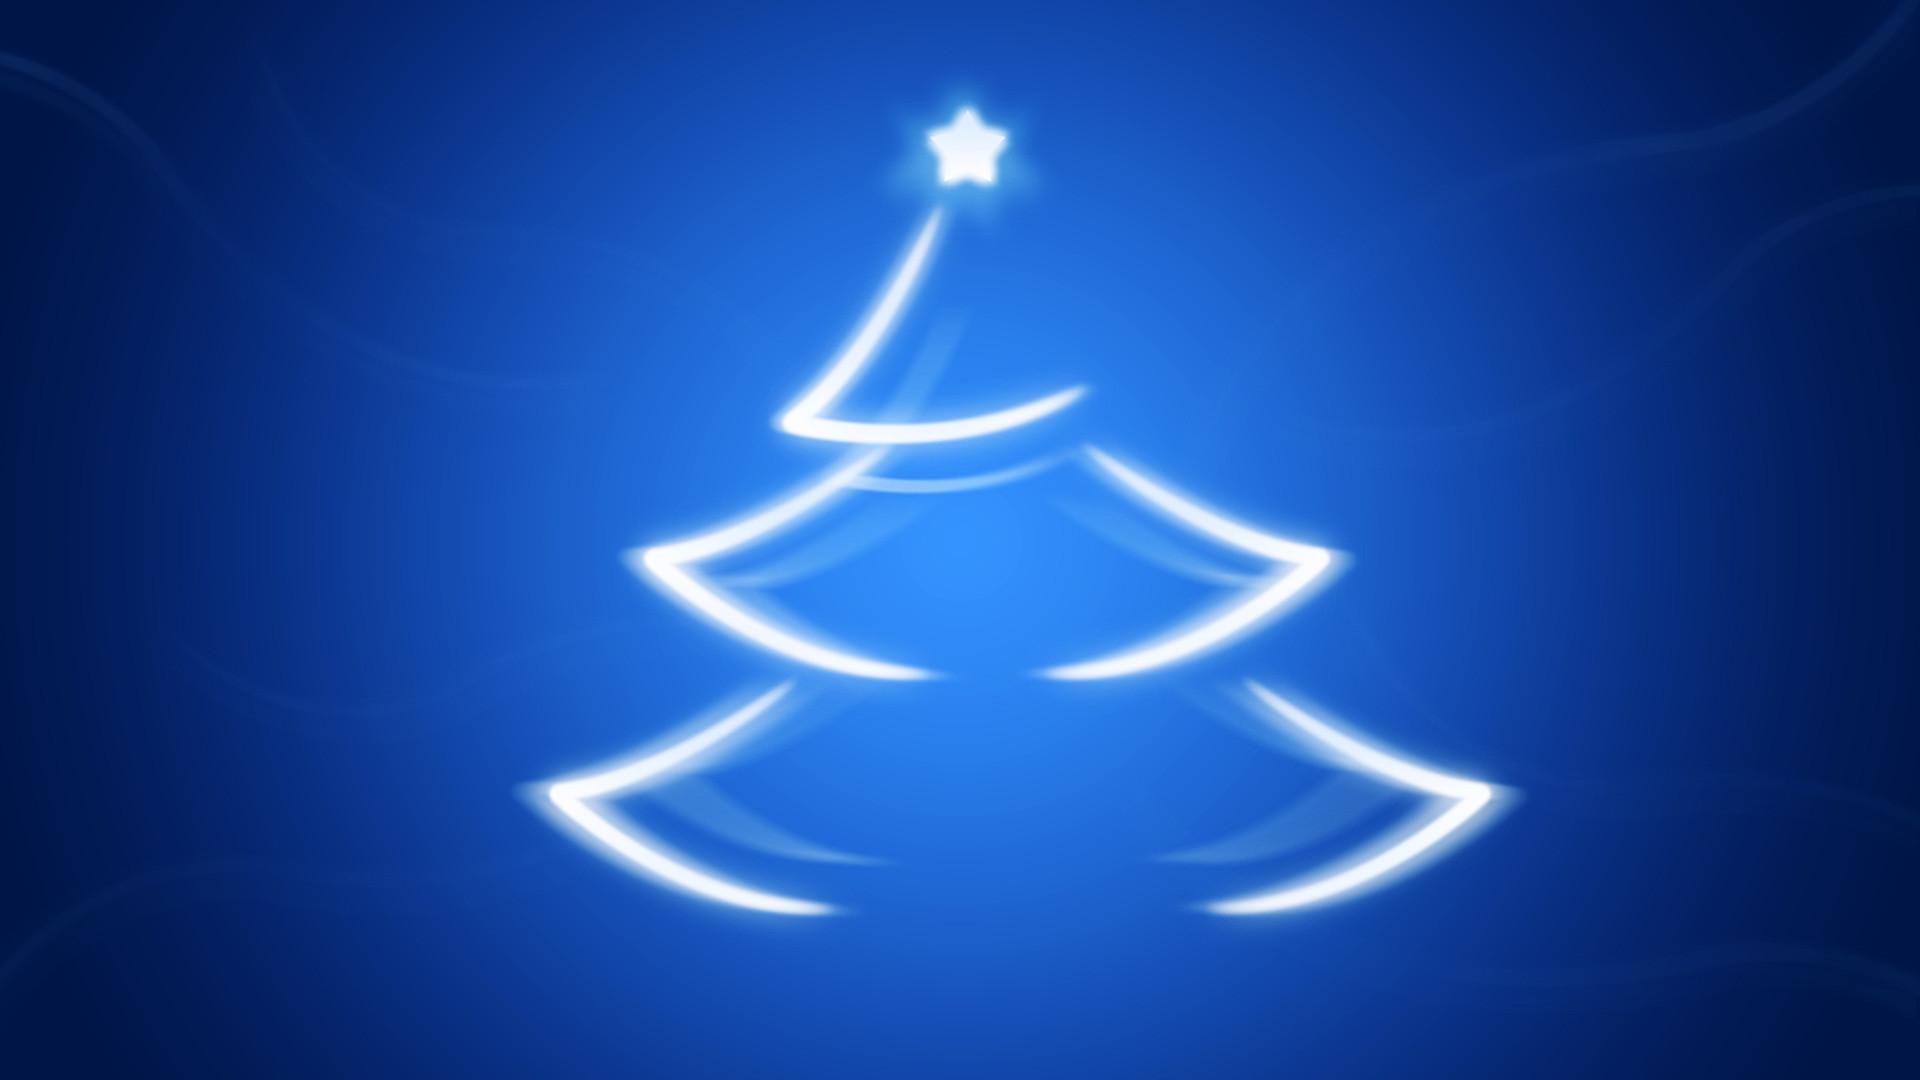 Res: 1920x1080, Light Christmas Tree